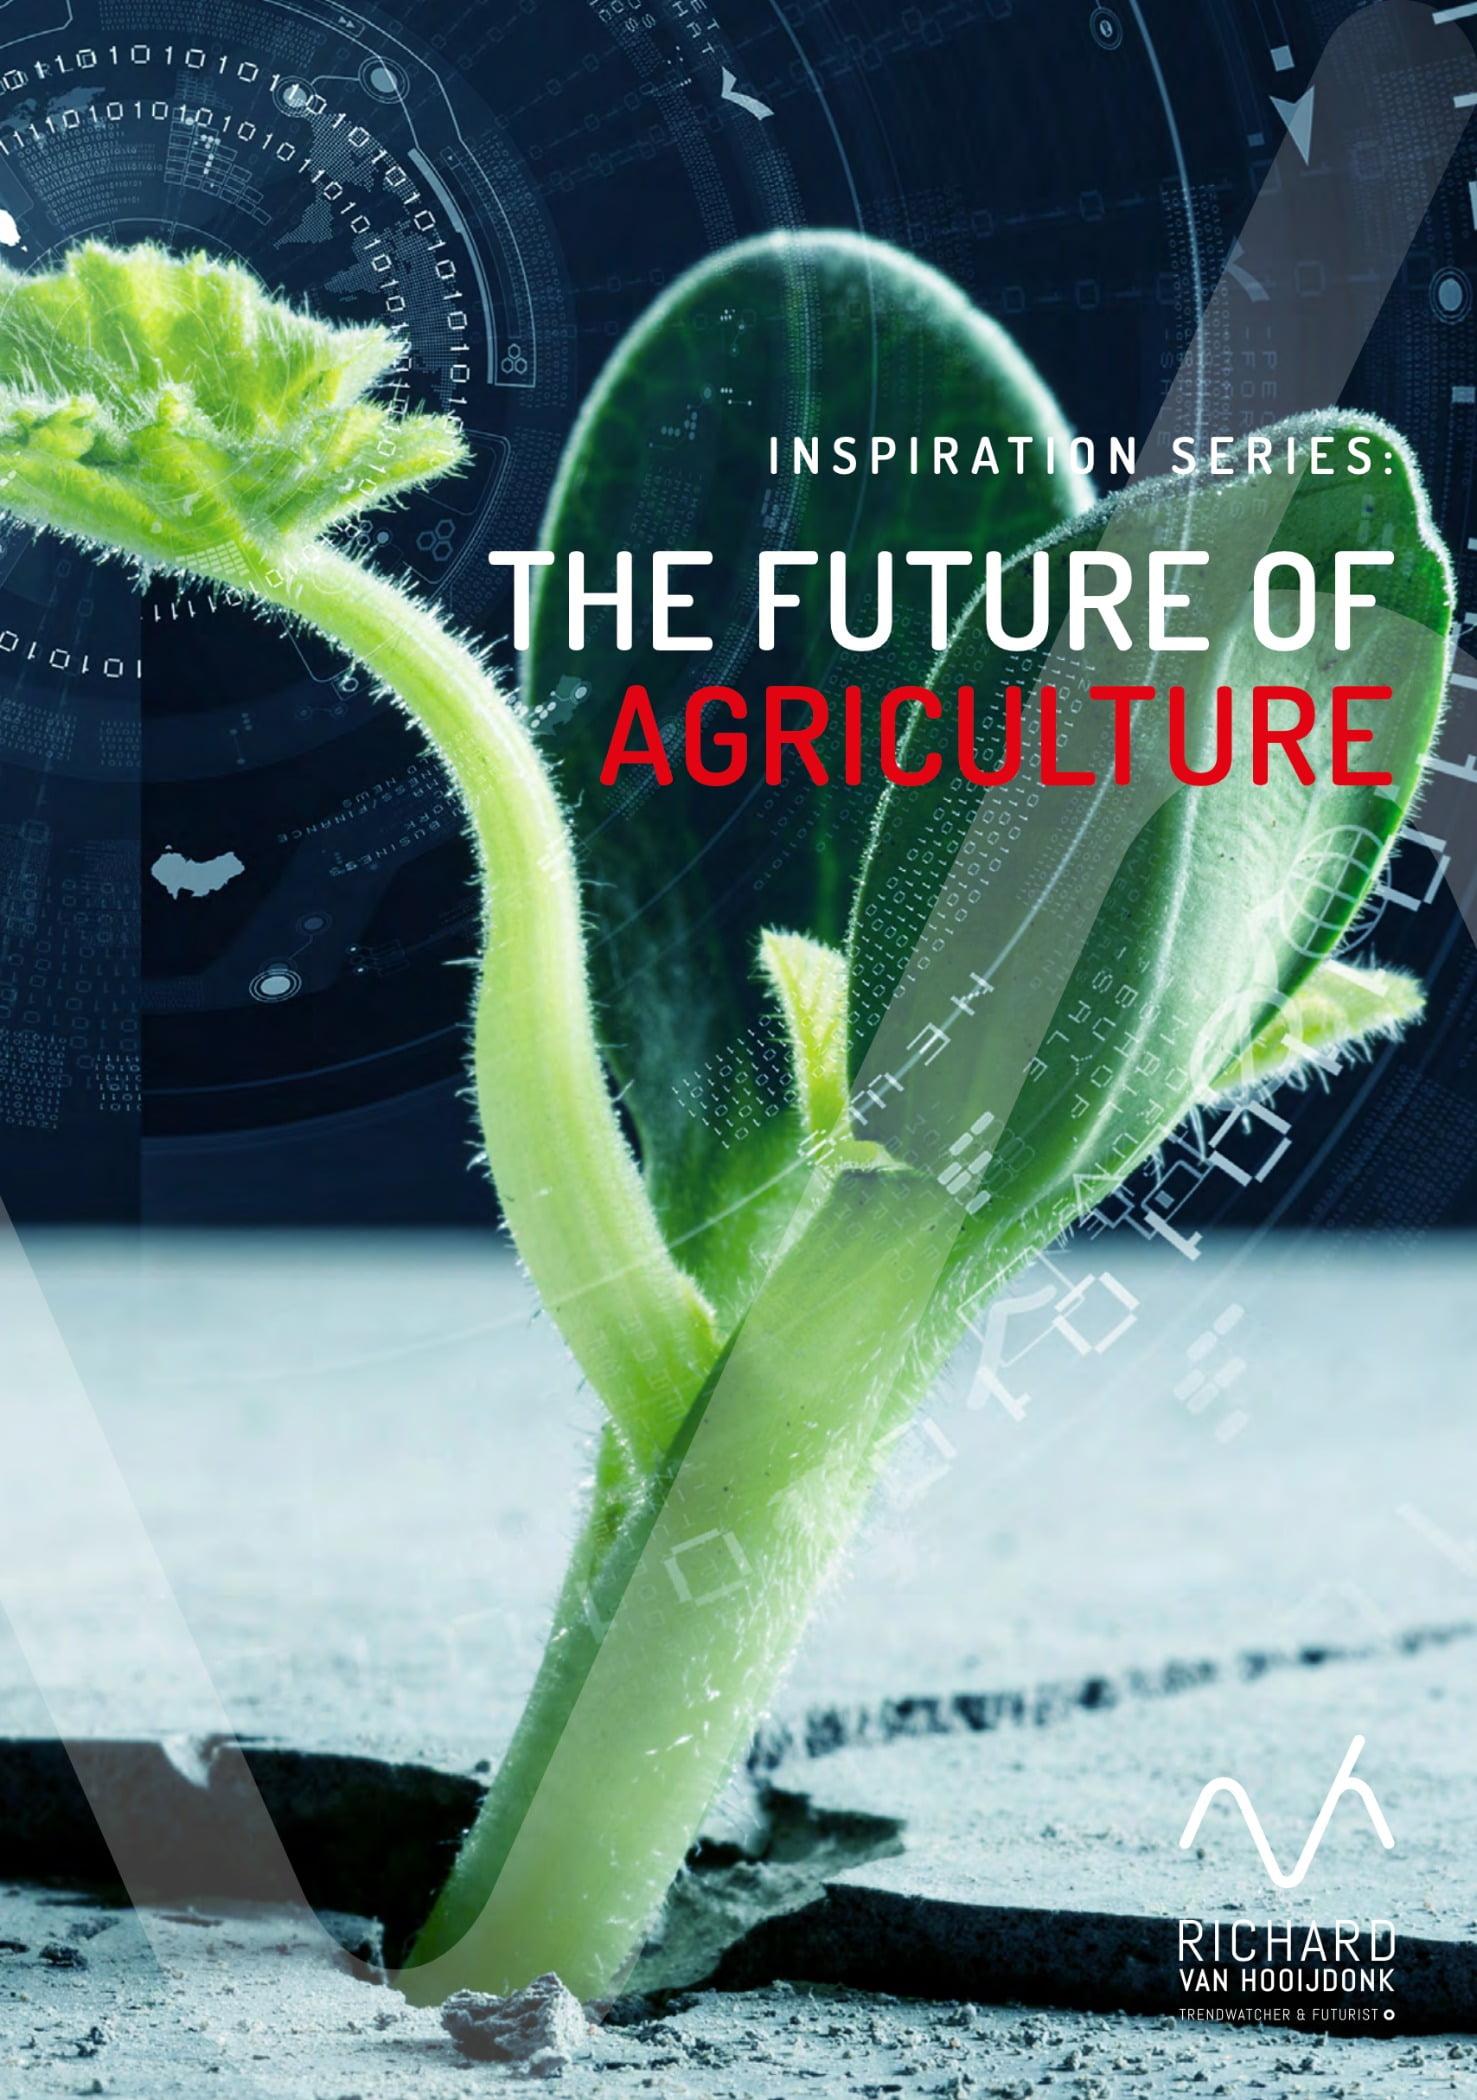 Terrestrial plant, Green, Botany, Organism, Houseplant, Food